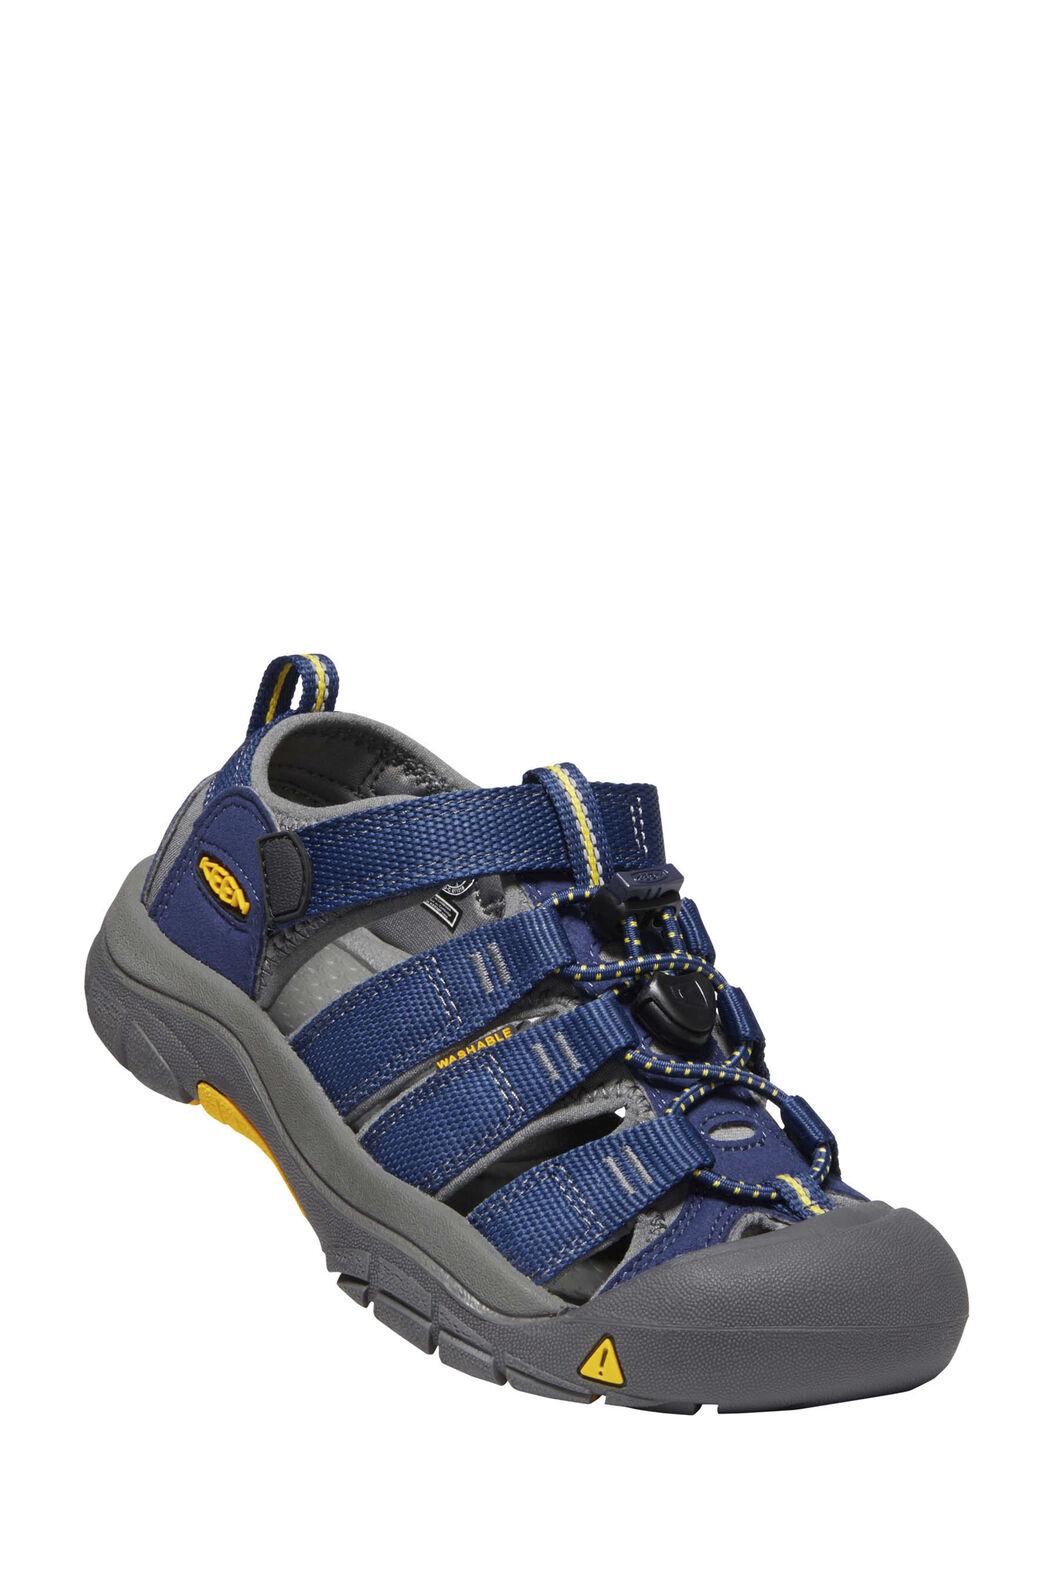 KEEN Newport H2 Sandals — Youth, Navy/Grey, hi-res